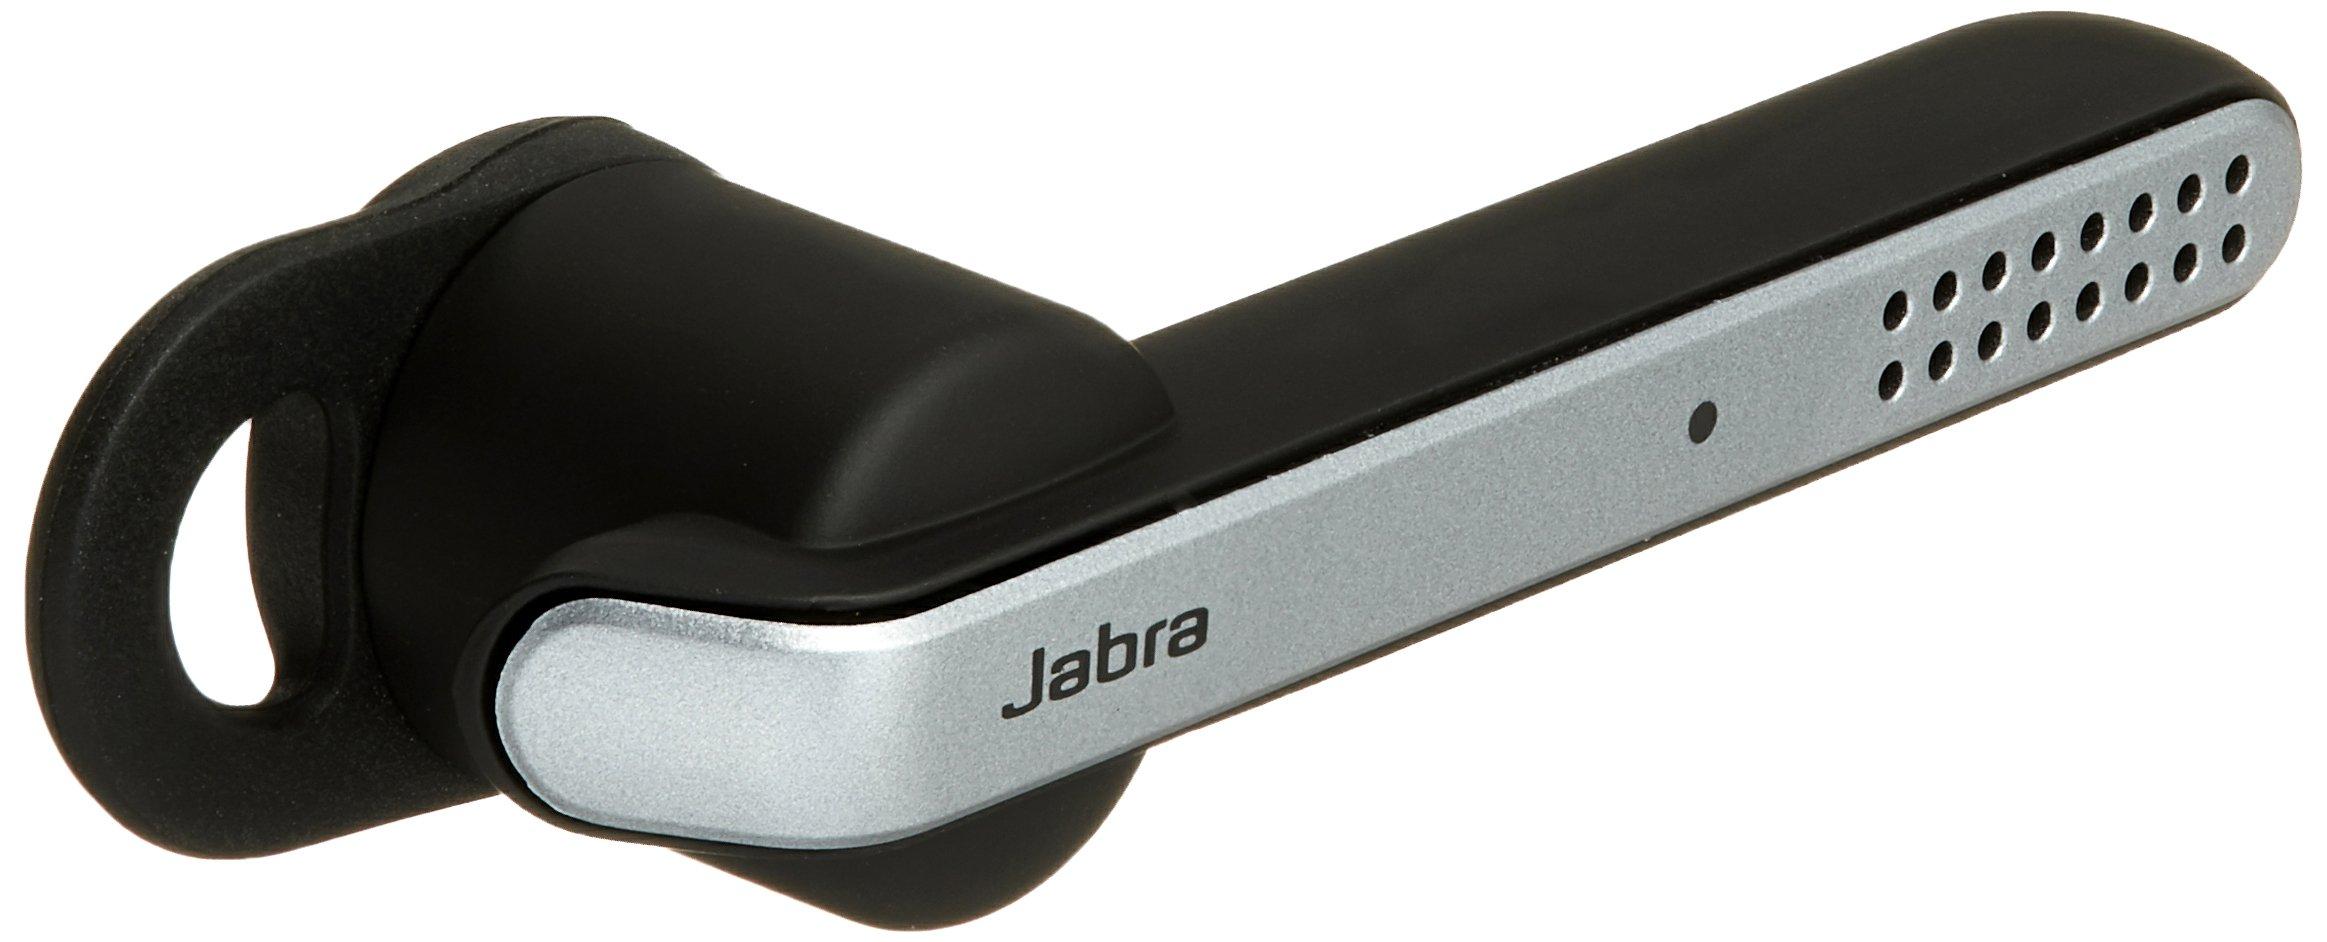 Jabra Stealth UC Professional Bluetooth Headset